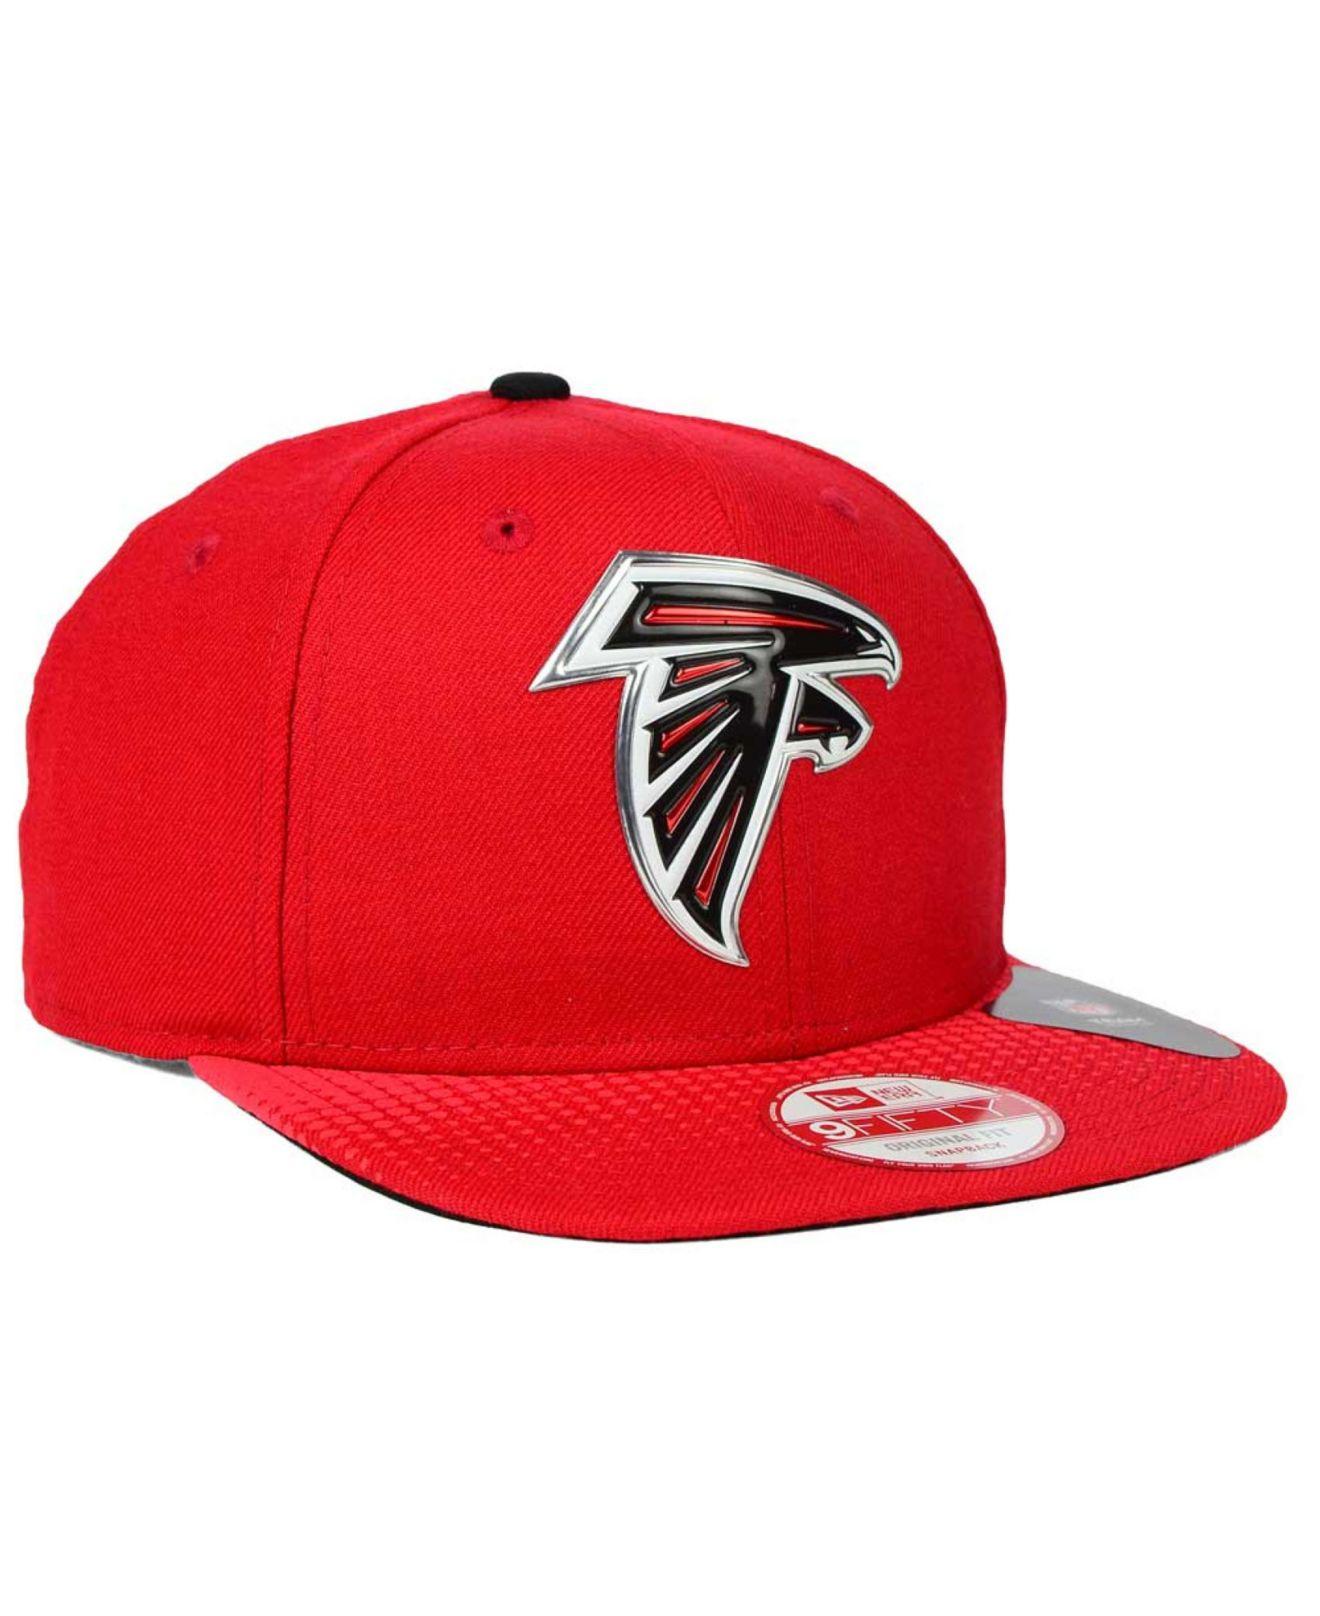 Lyst - KTZ Atlanta Falcons Draft Redux 9fifty Snapback Cap in Red ... a0cb908be55